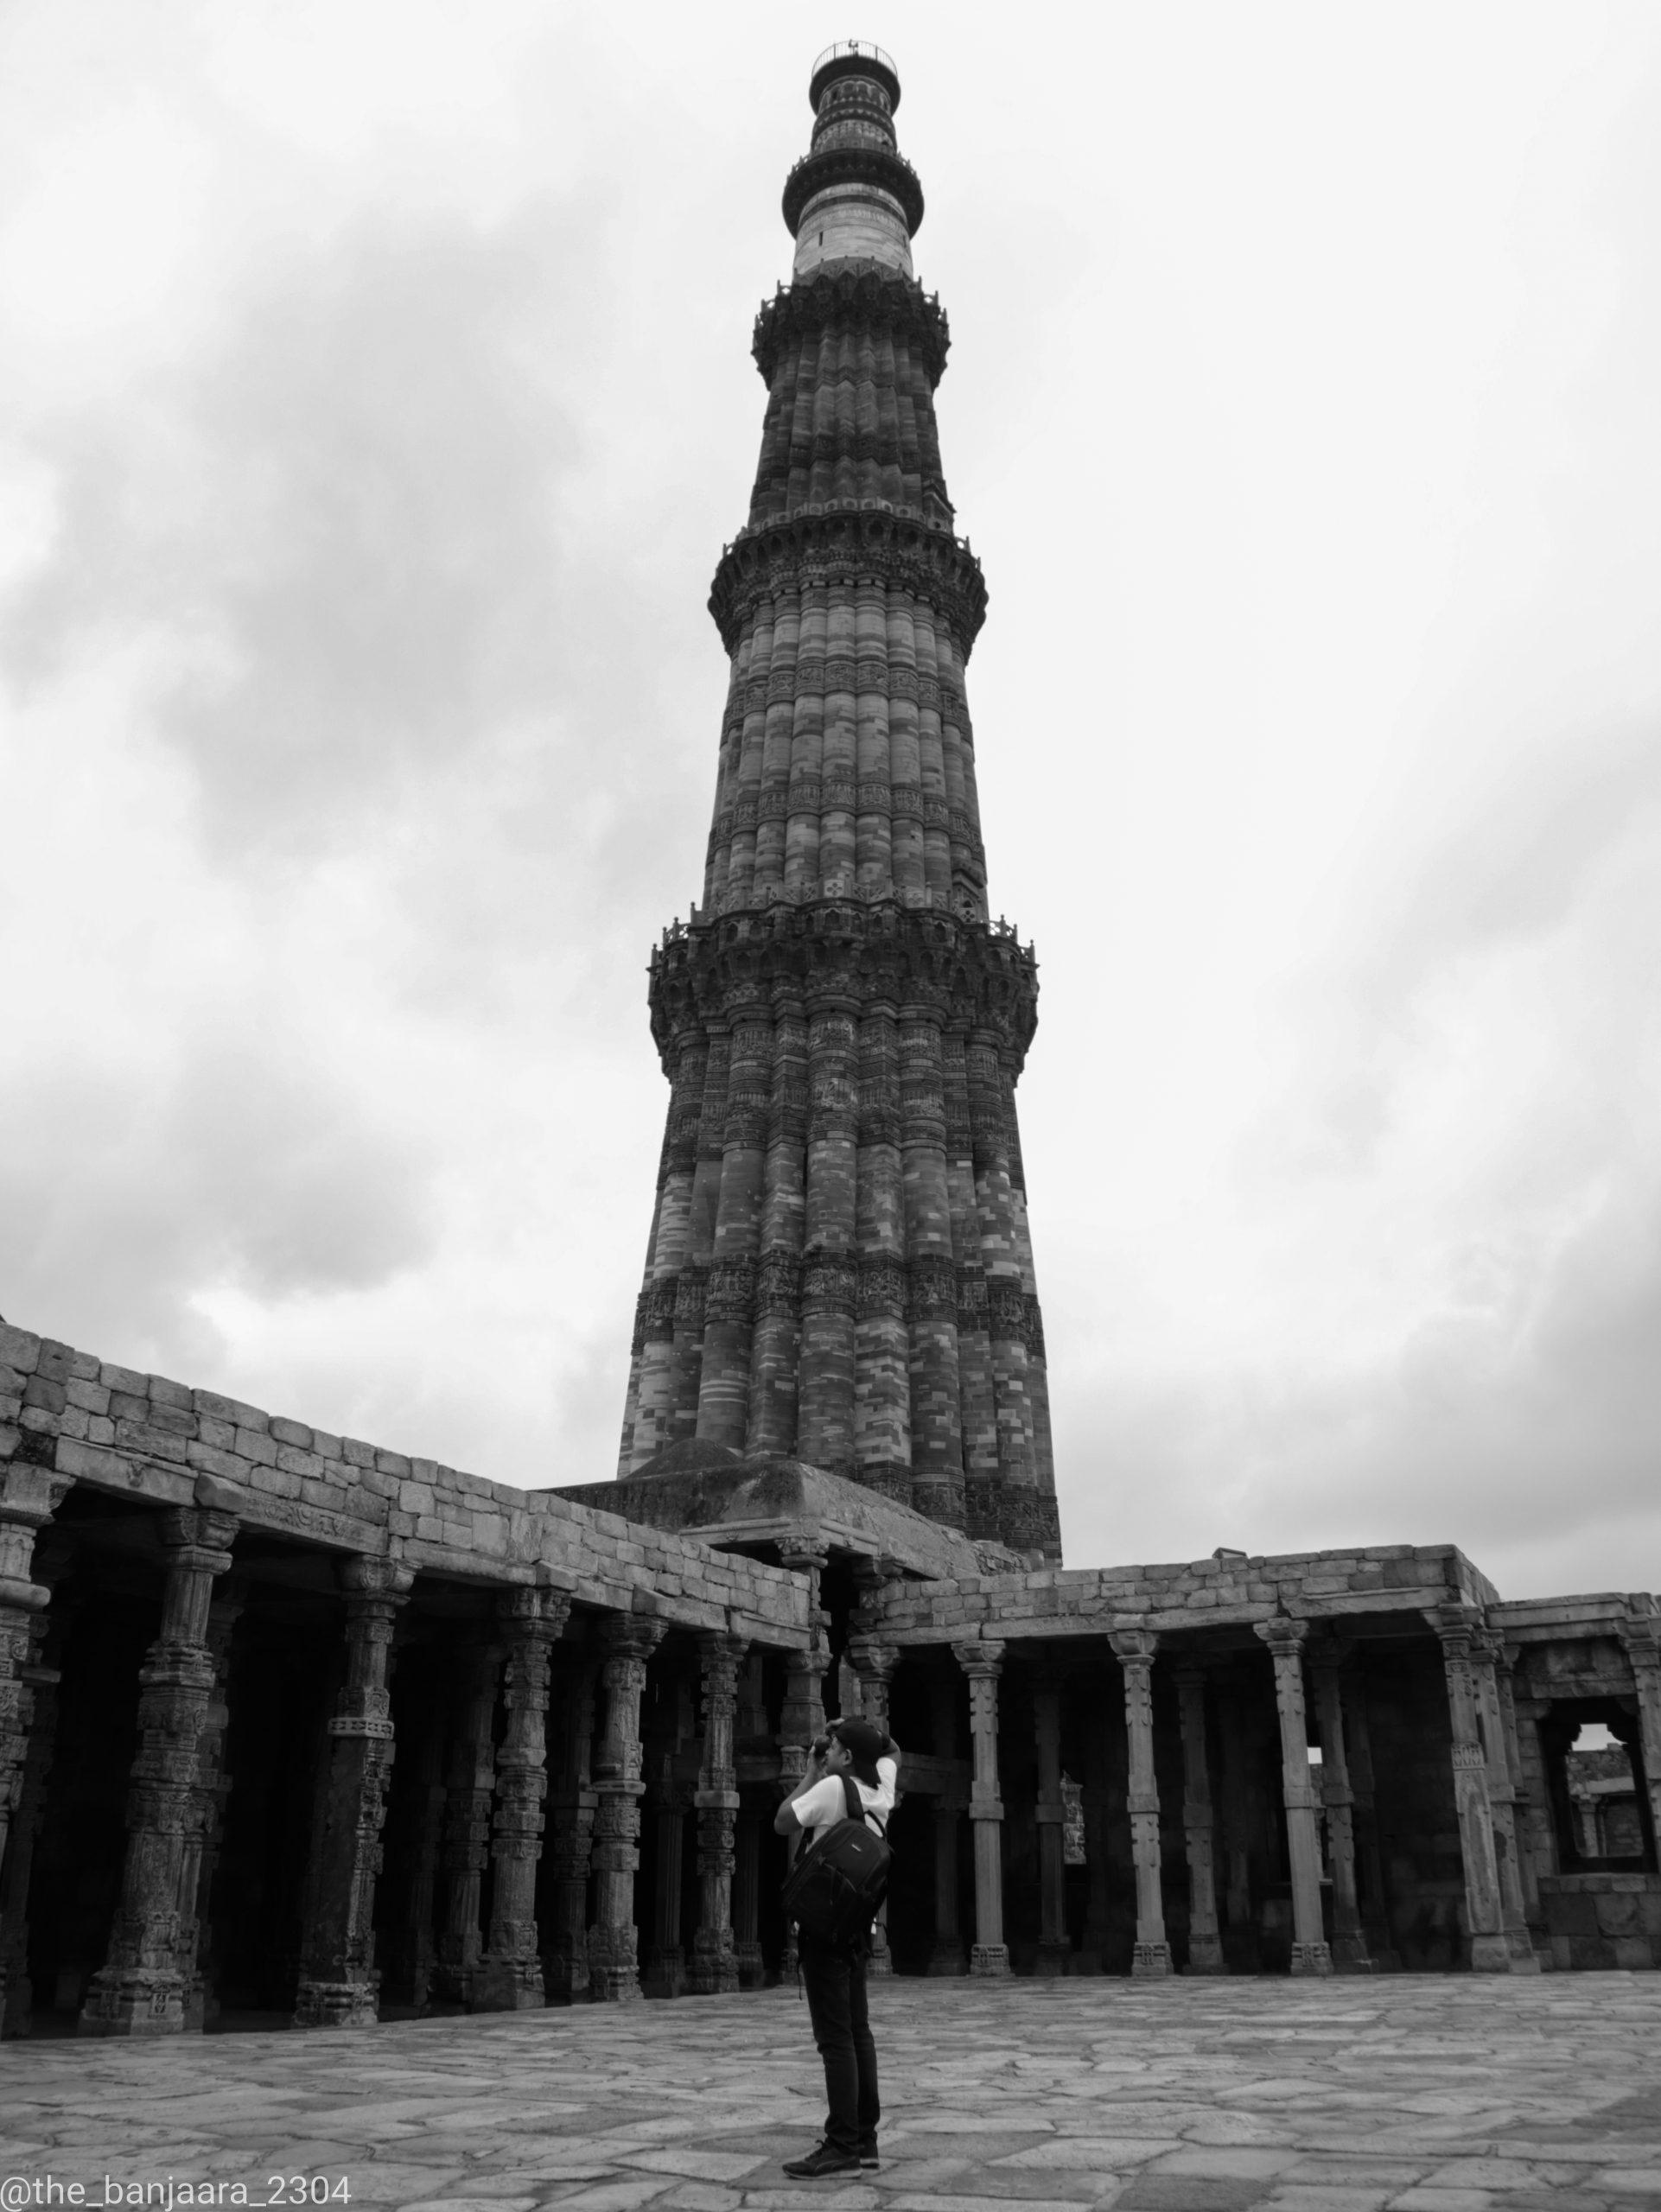 A greyscale view of Qutub Minar